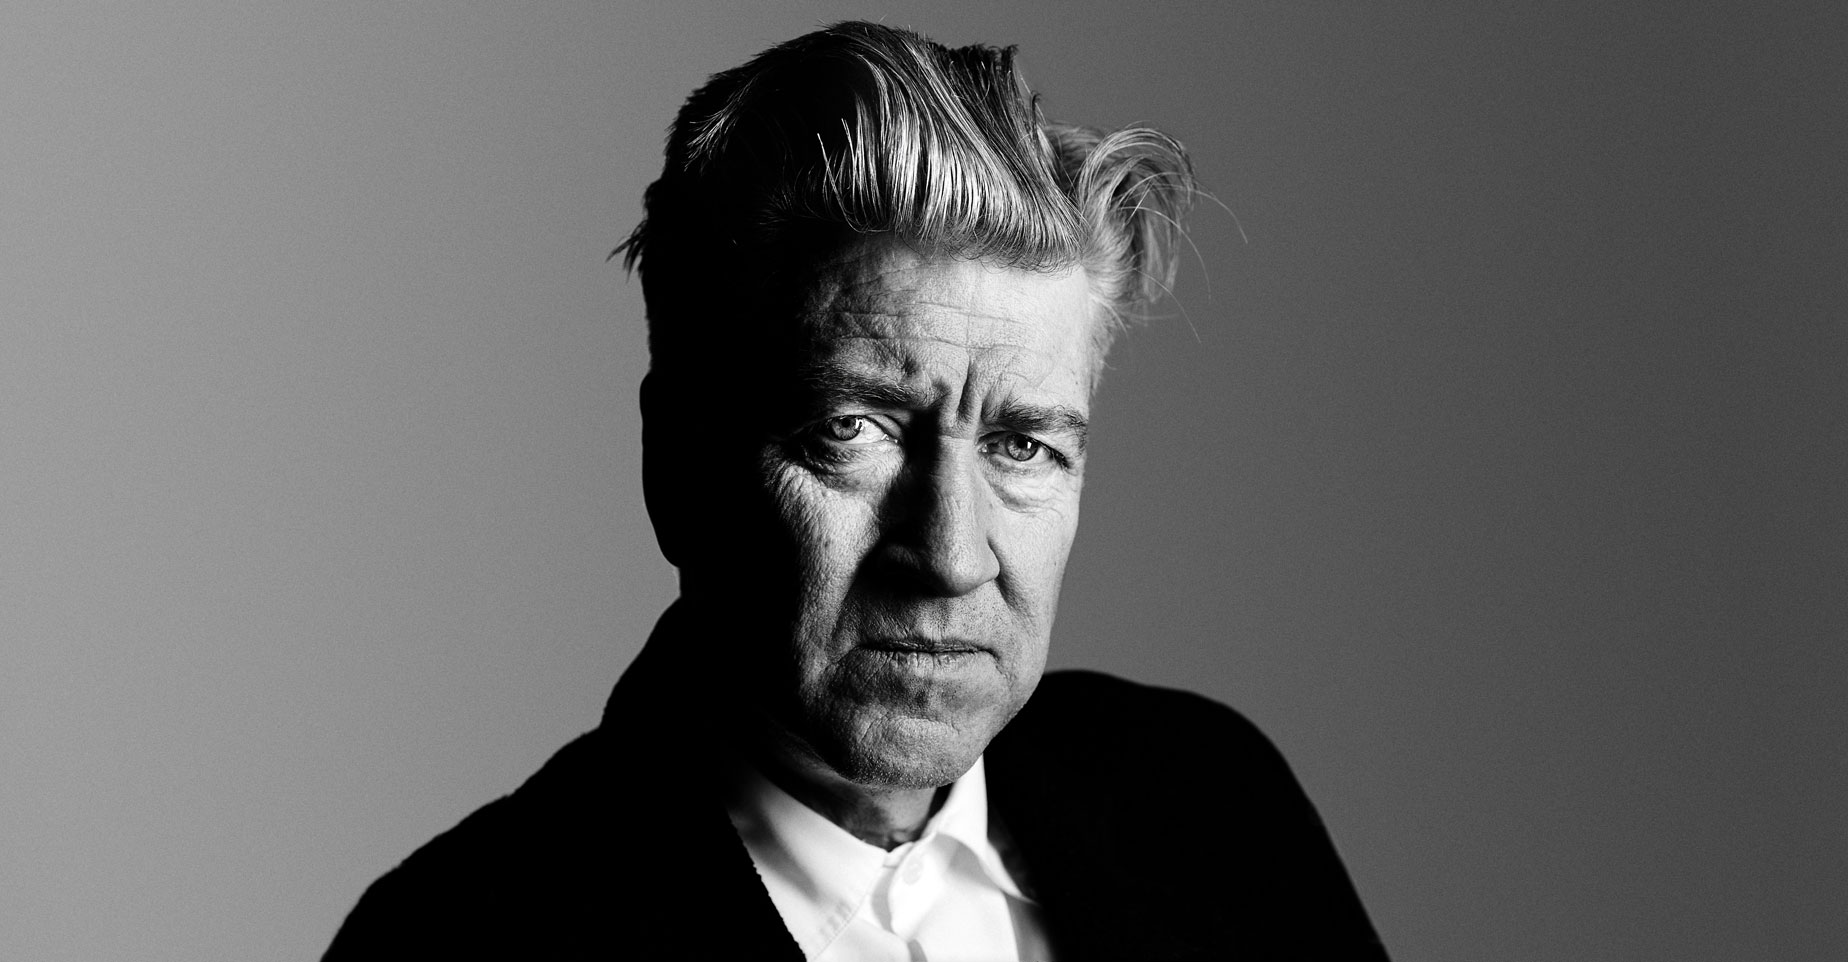 David Lynch (b. 1946)